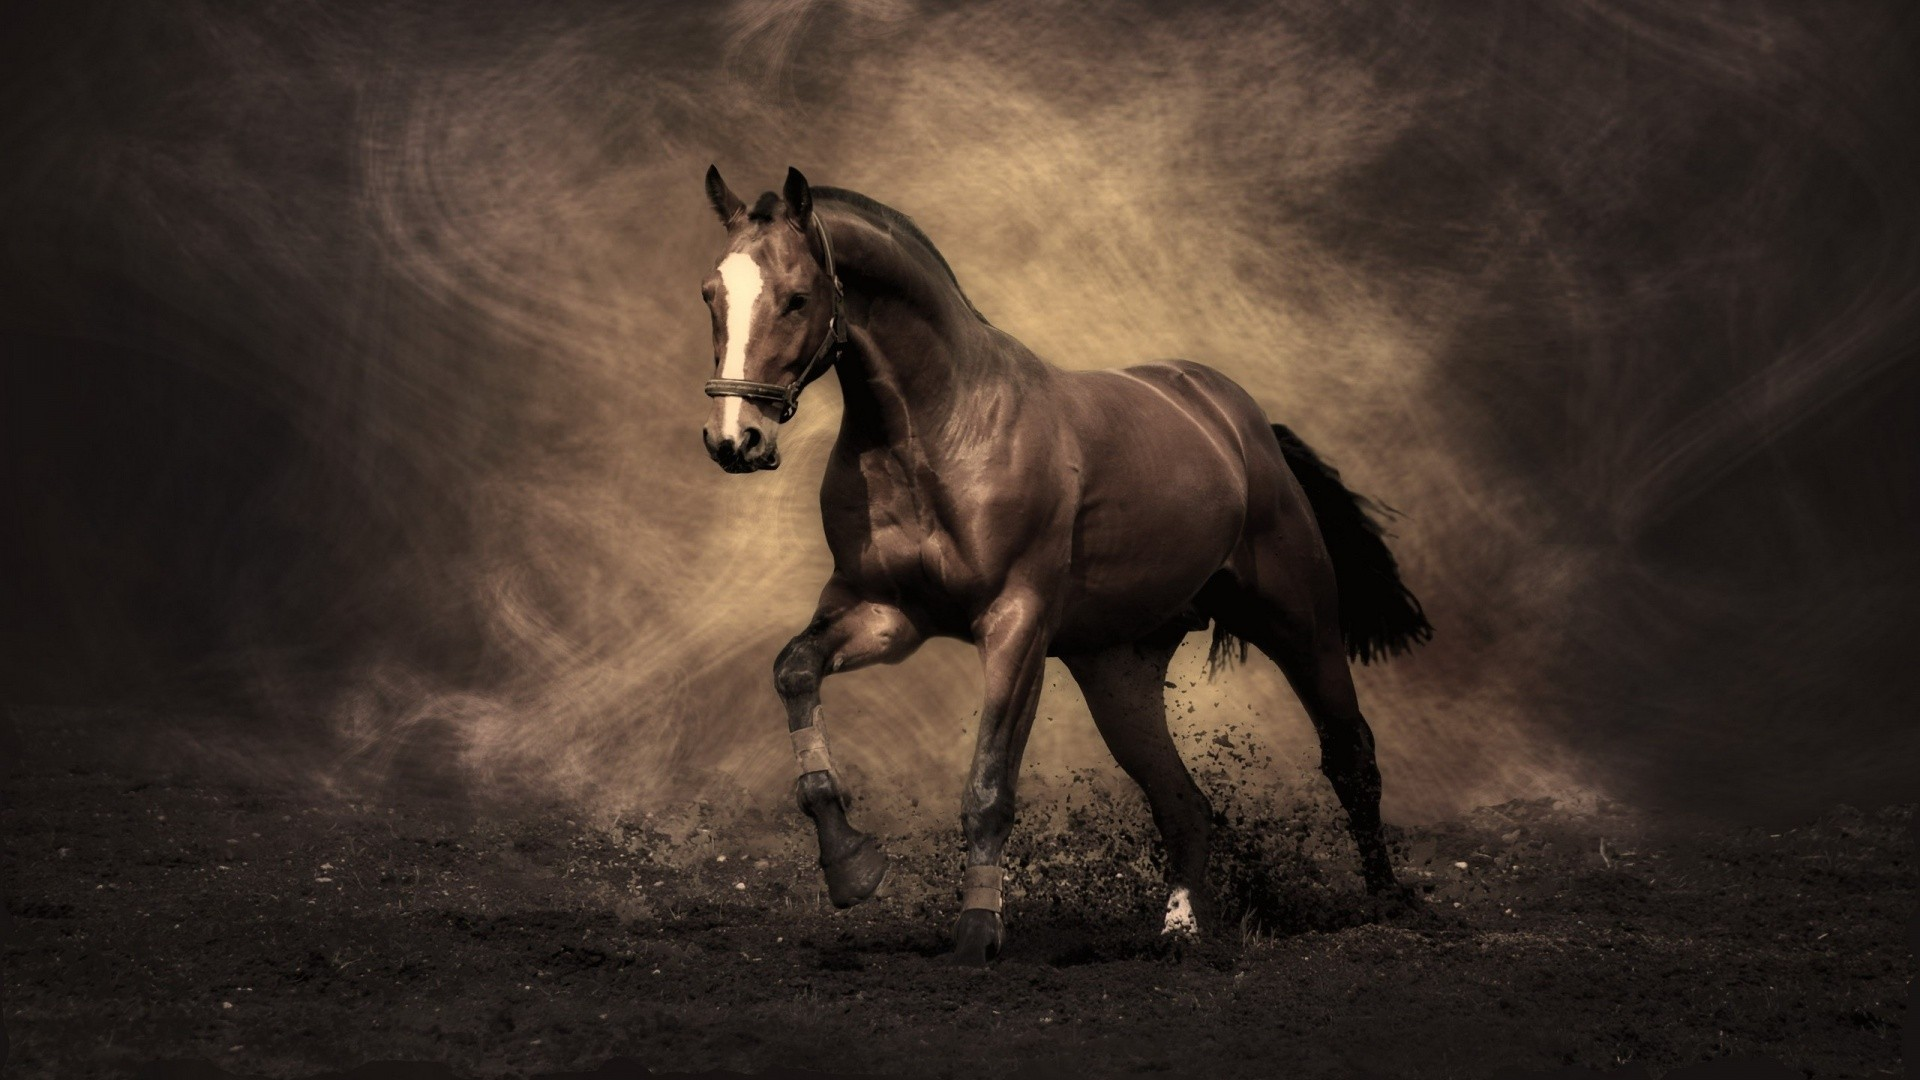 General 1920x1080 horse nature brown